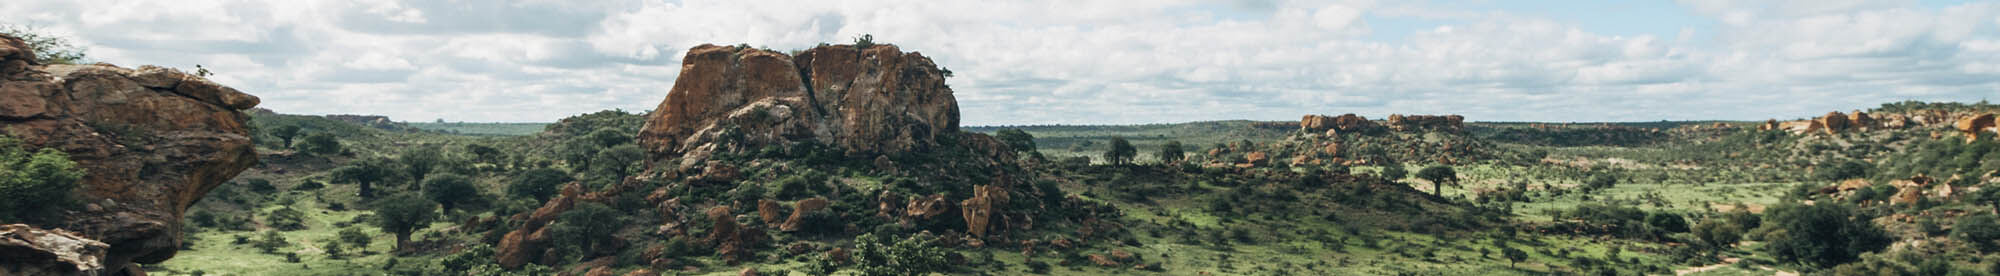 mopane_southafrica